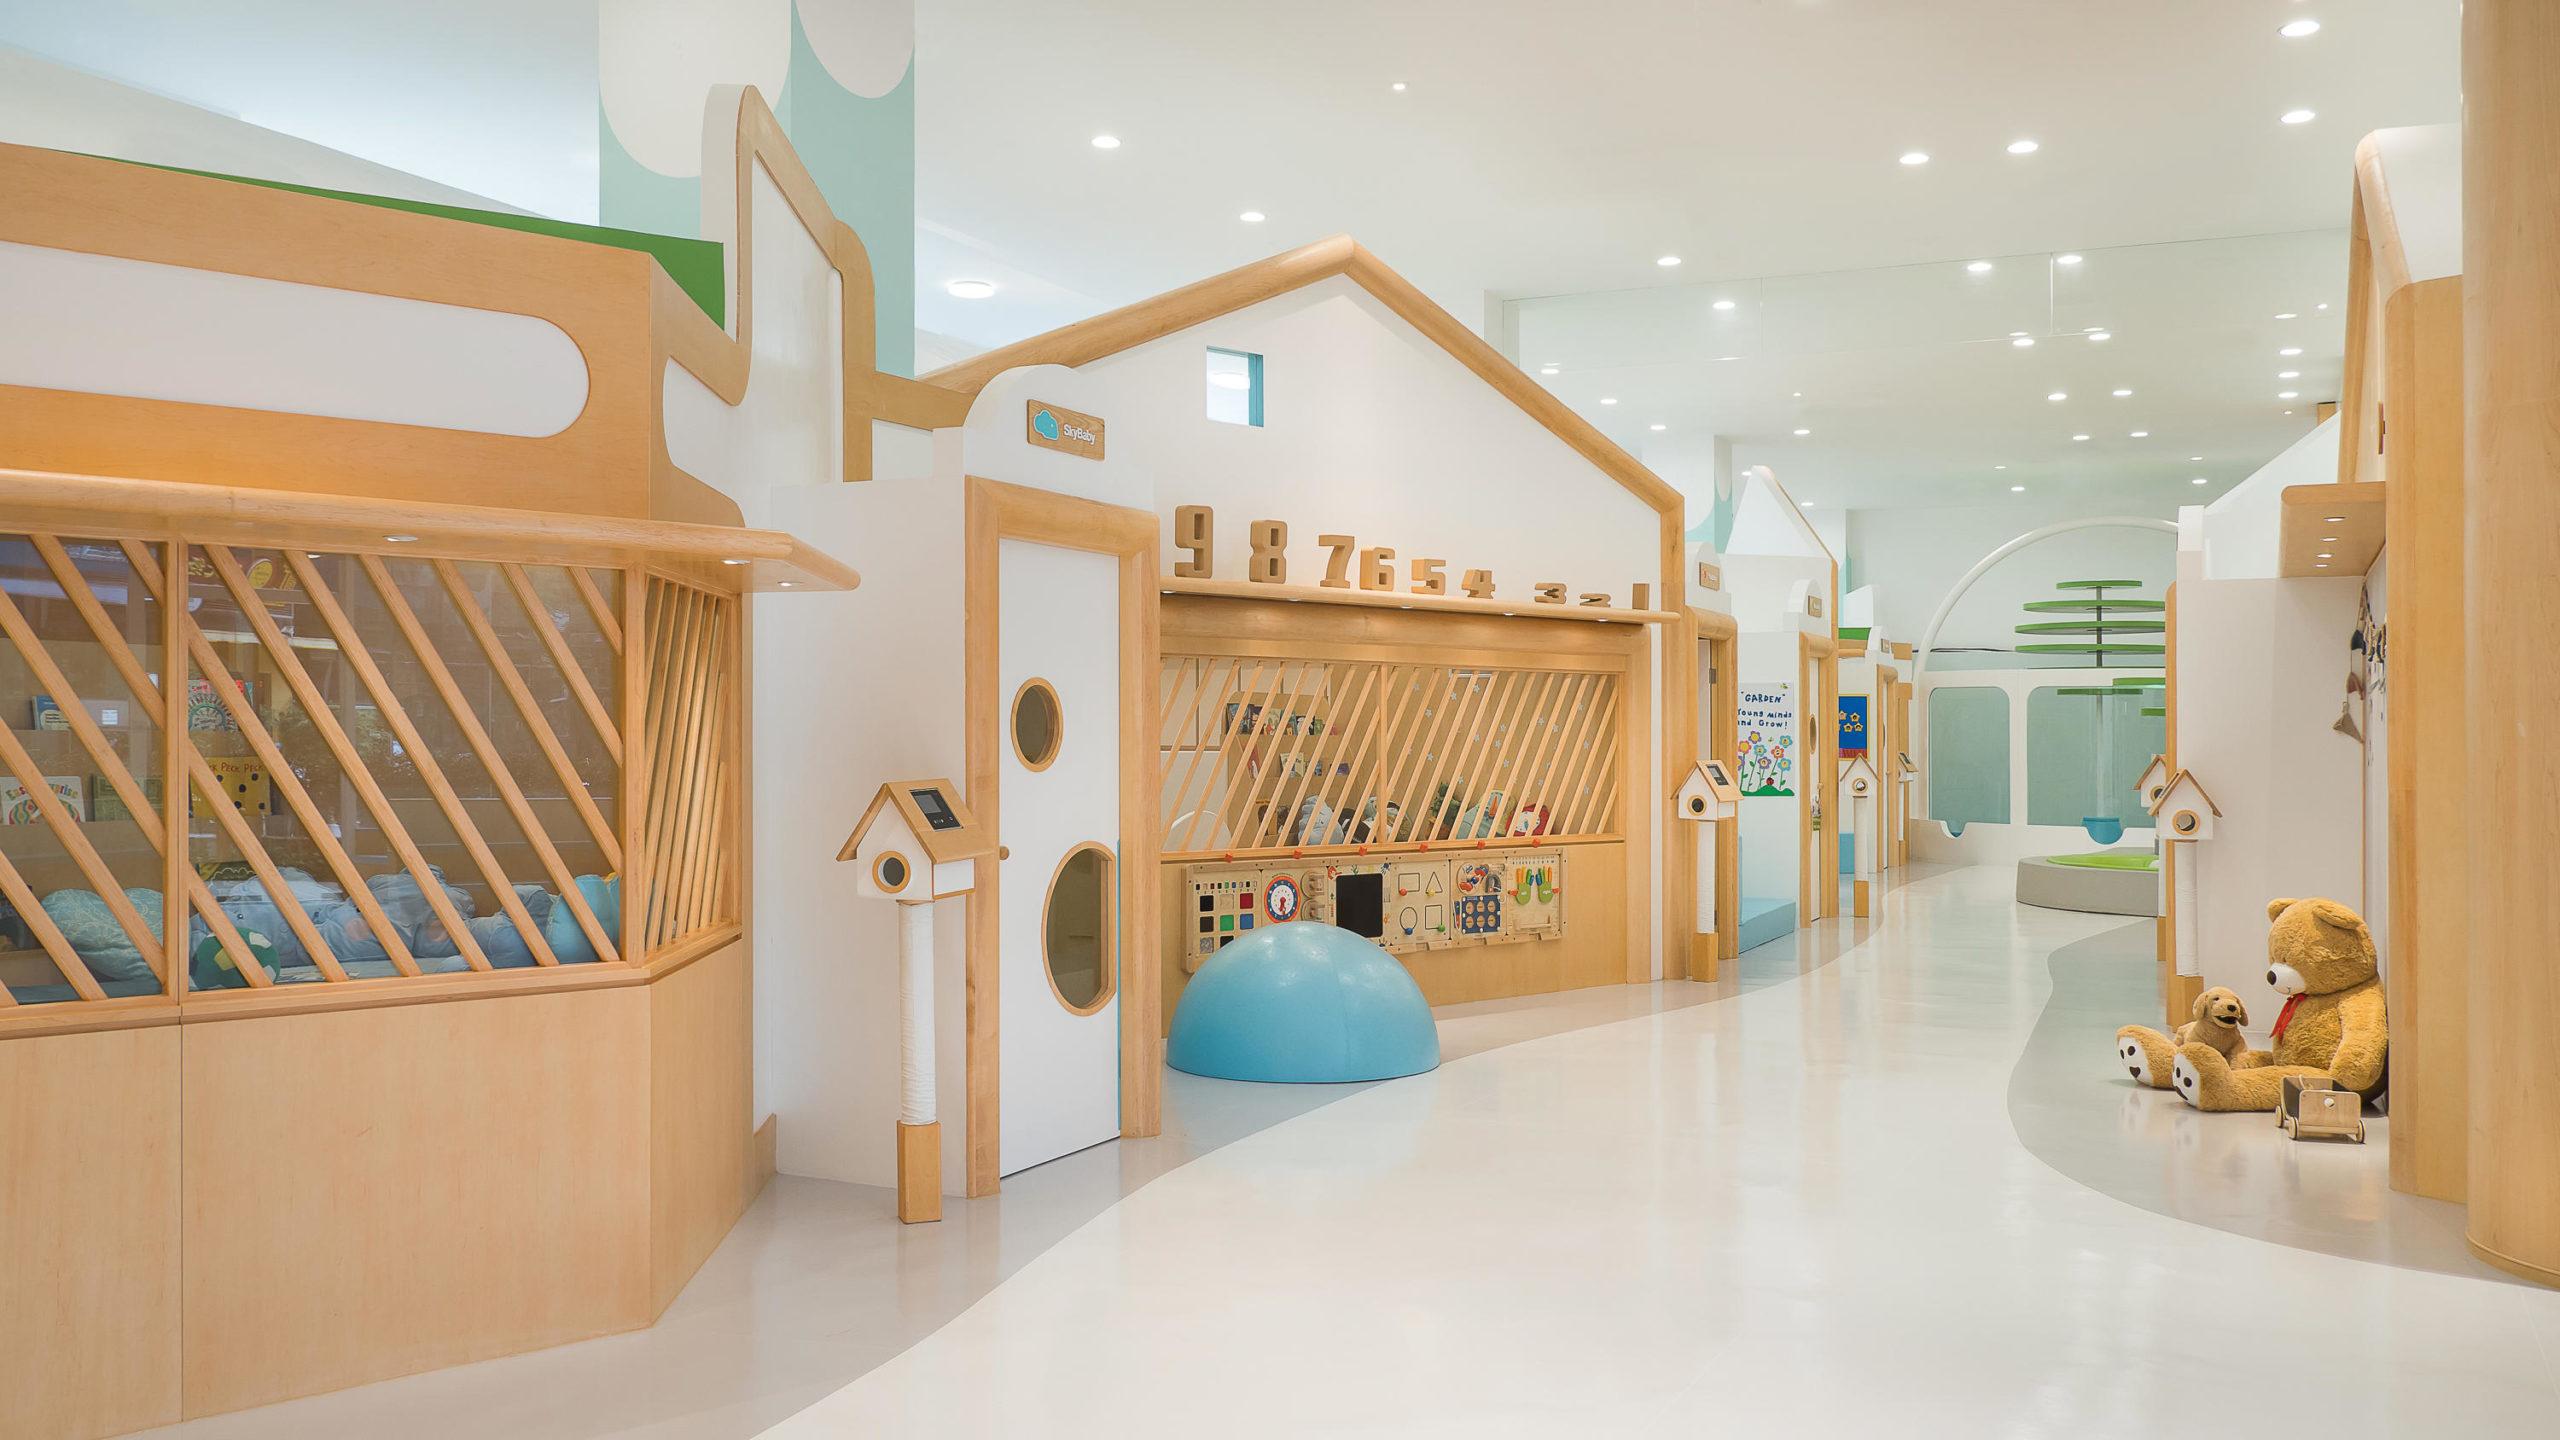 vmdpe-design-benebaby-international-daycare-architonic-benebaby-vmdpe-20180314-l-7-01-arcit18